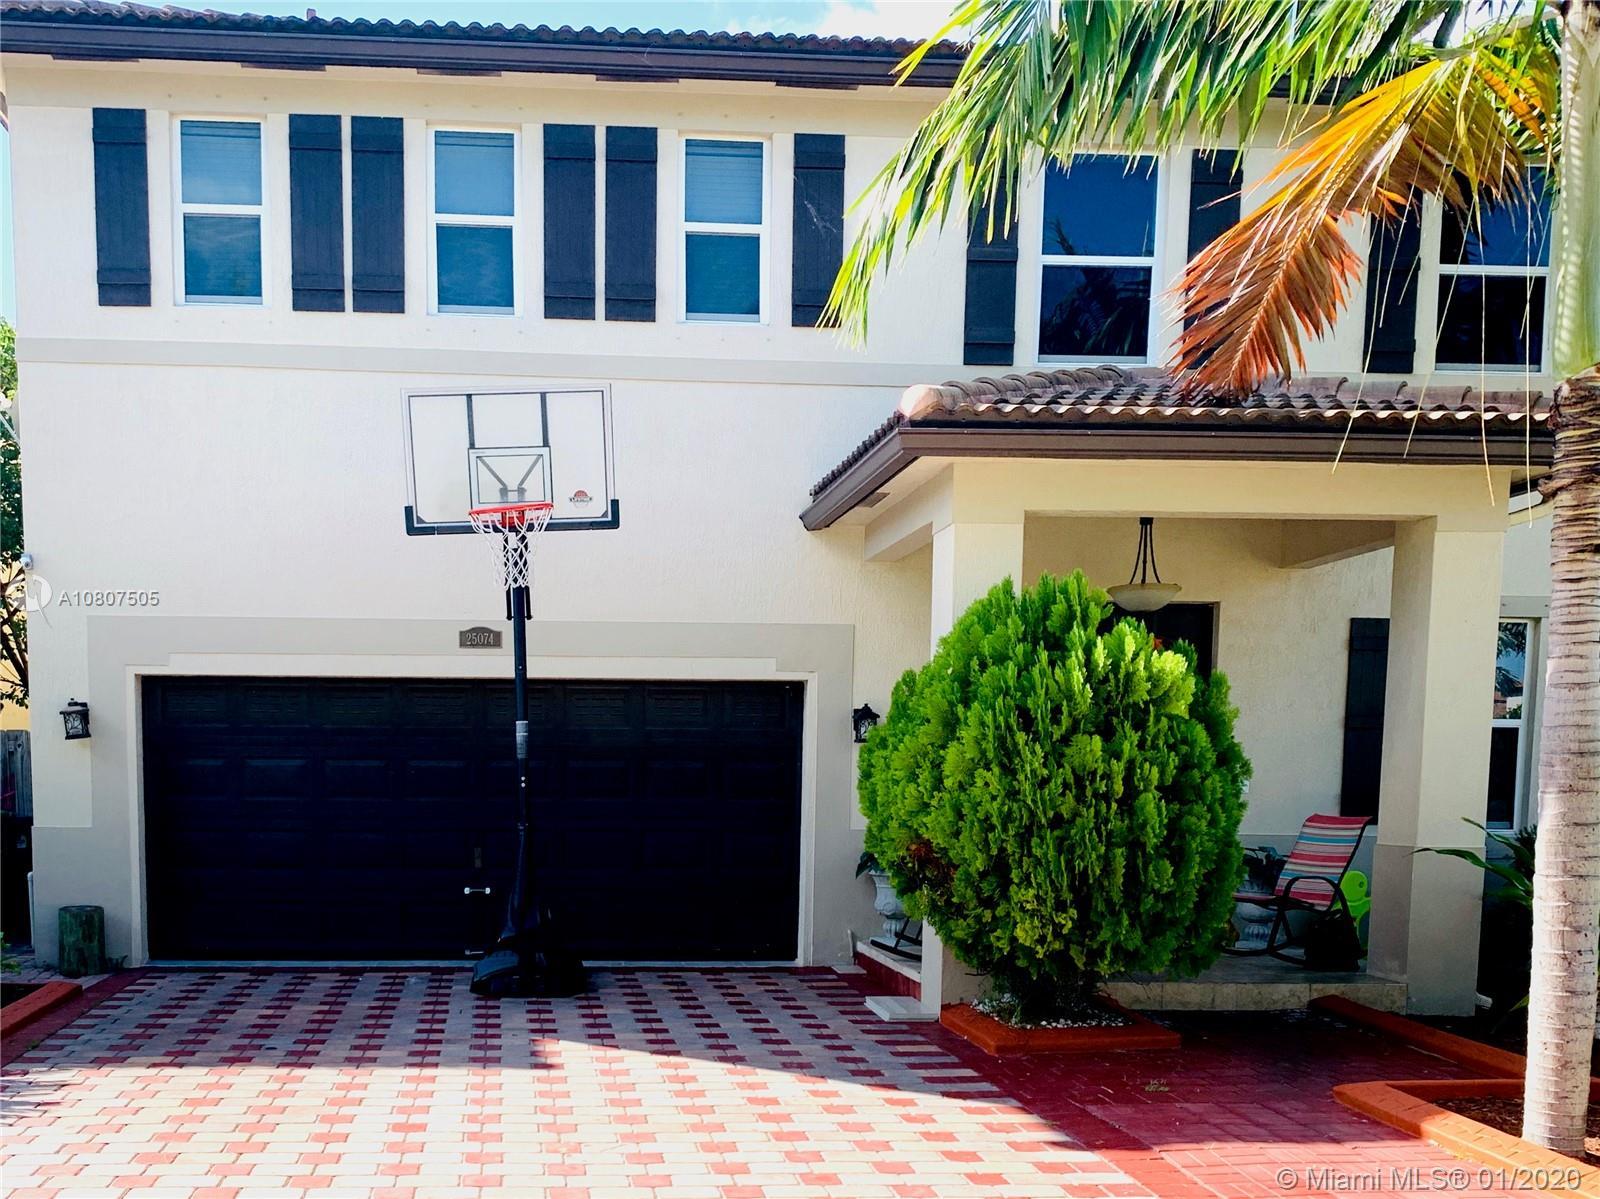 25074 SW 118th Pl, Homestead, FL 33032 - Homestead, FL real estate listing